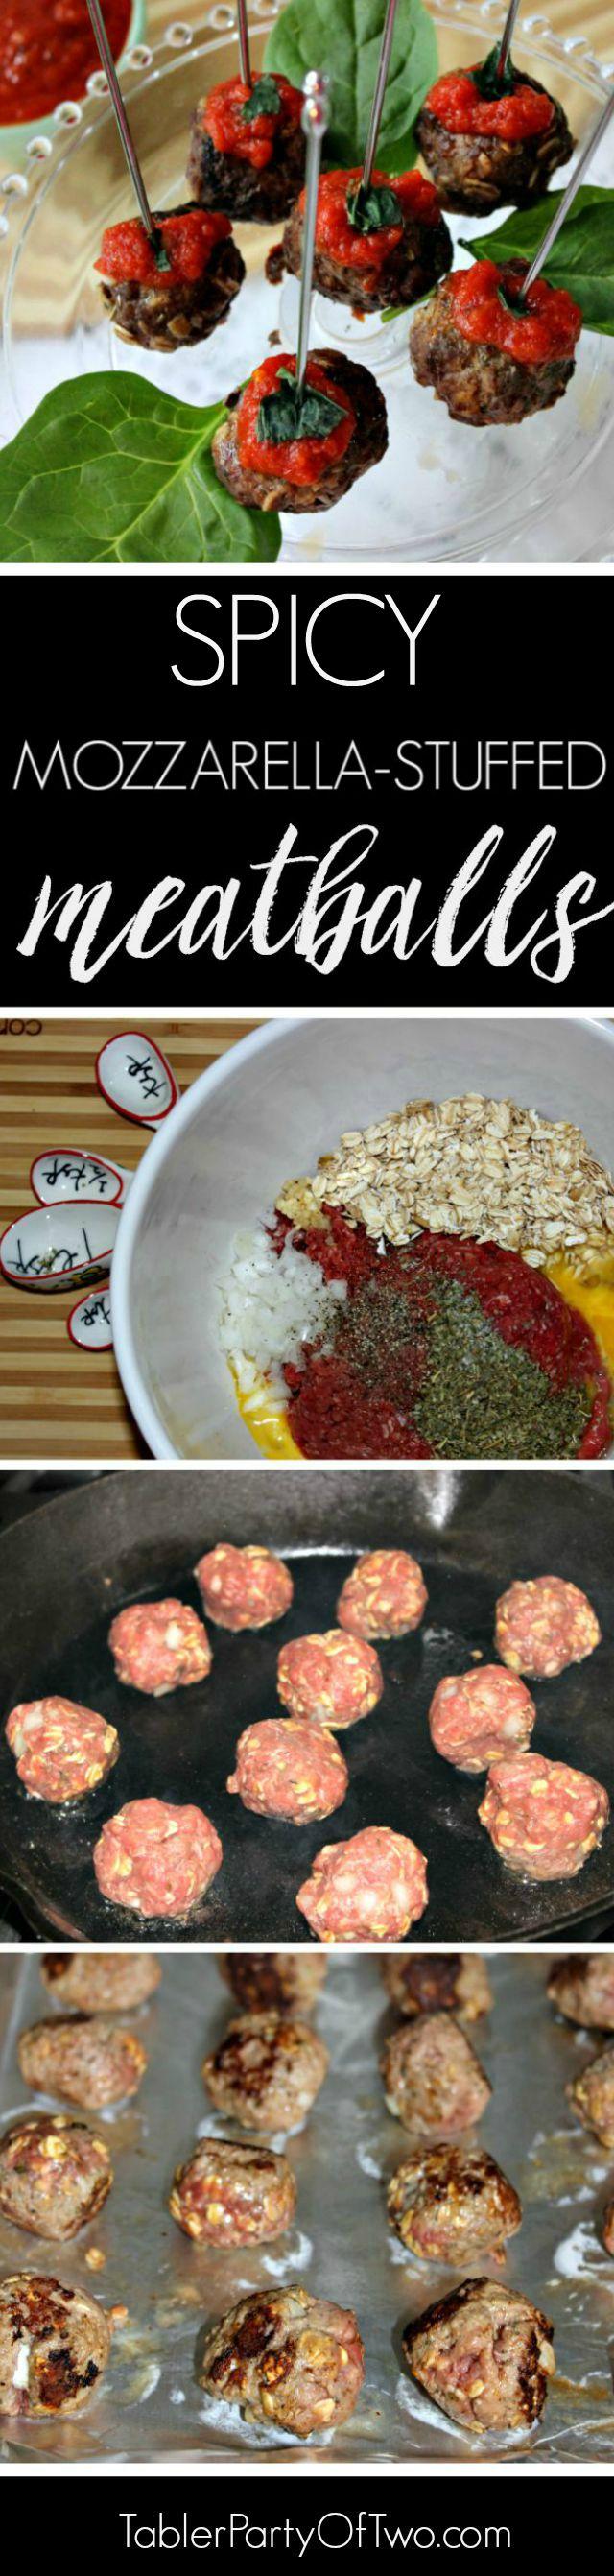 Mozzarella Stuffed Marinara Meatballs. Super yummy and even skinny! TablerPartyofTwo.com